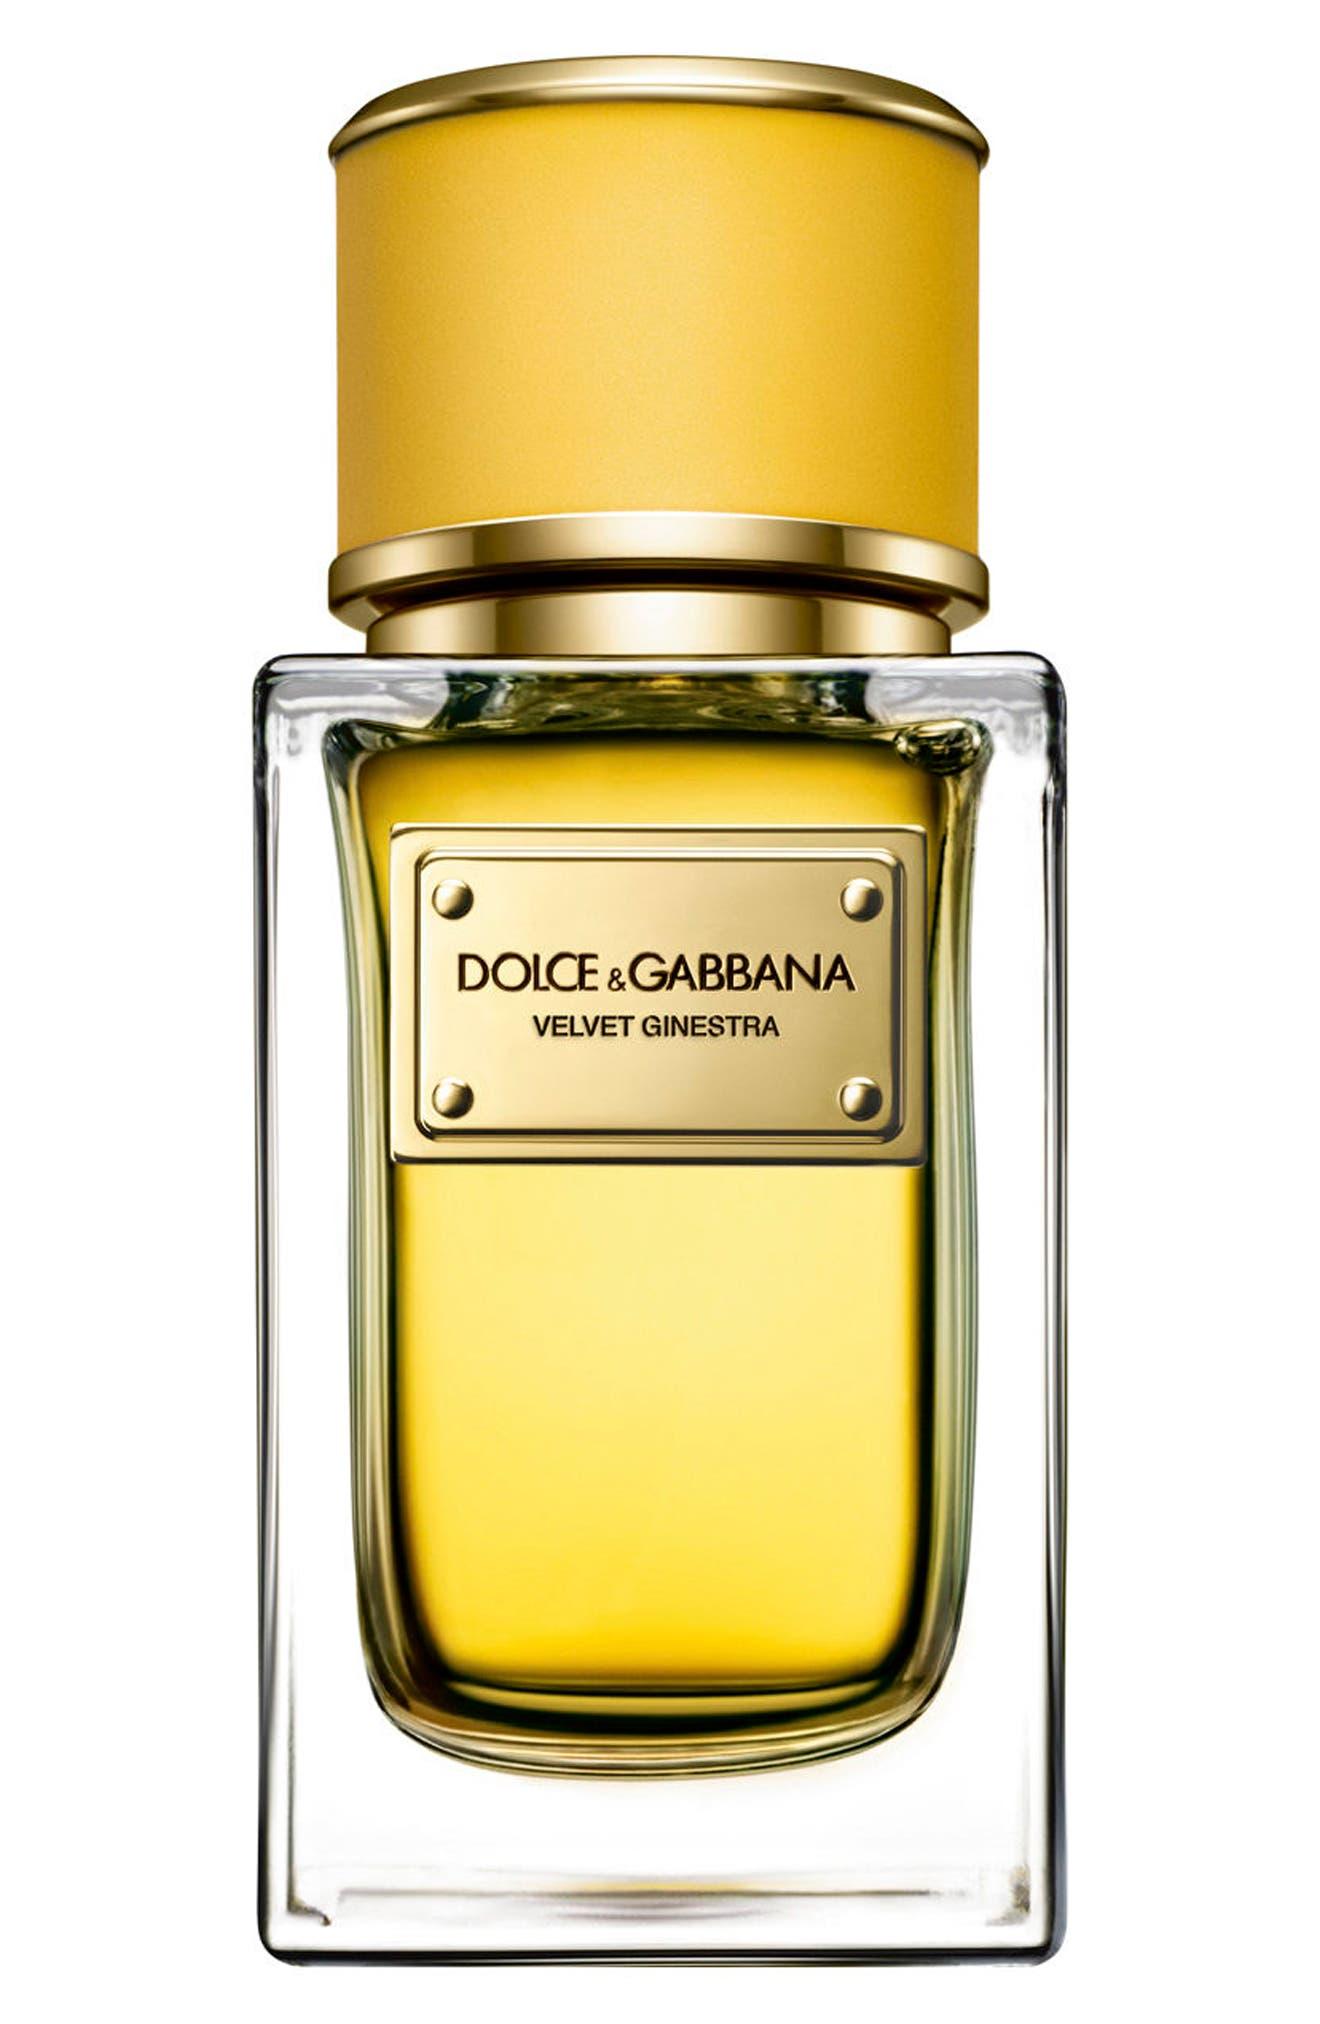 Alternate Image 1 Selected - Dolce&Gabbana Beauty 'Velvet Ginestra' Eau de Parfum